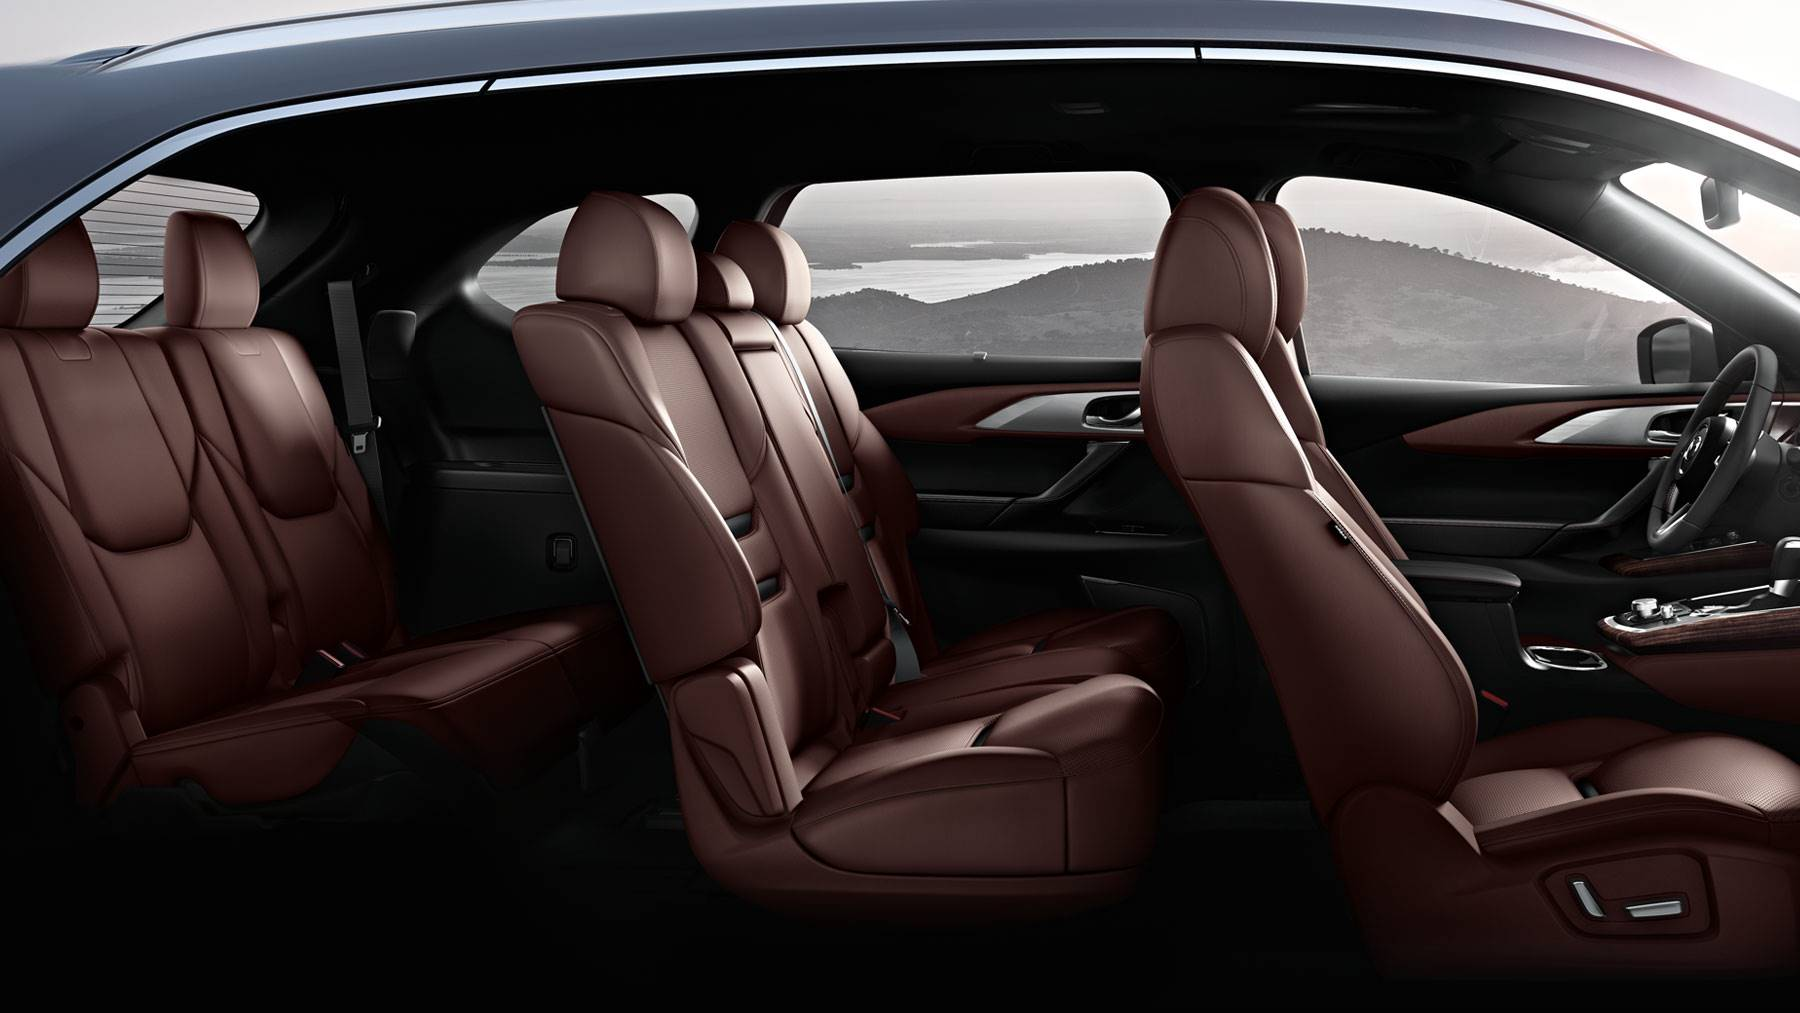 Enjoy the 3-Row 2019 Mazda CX-9!